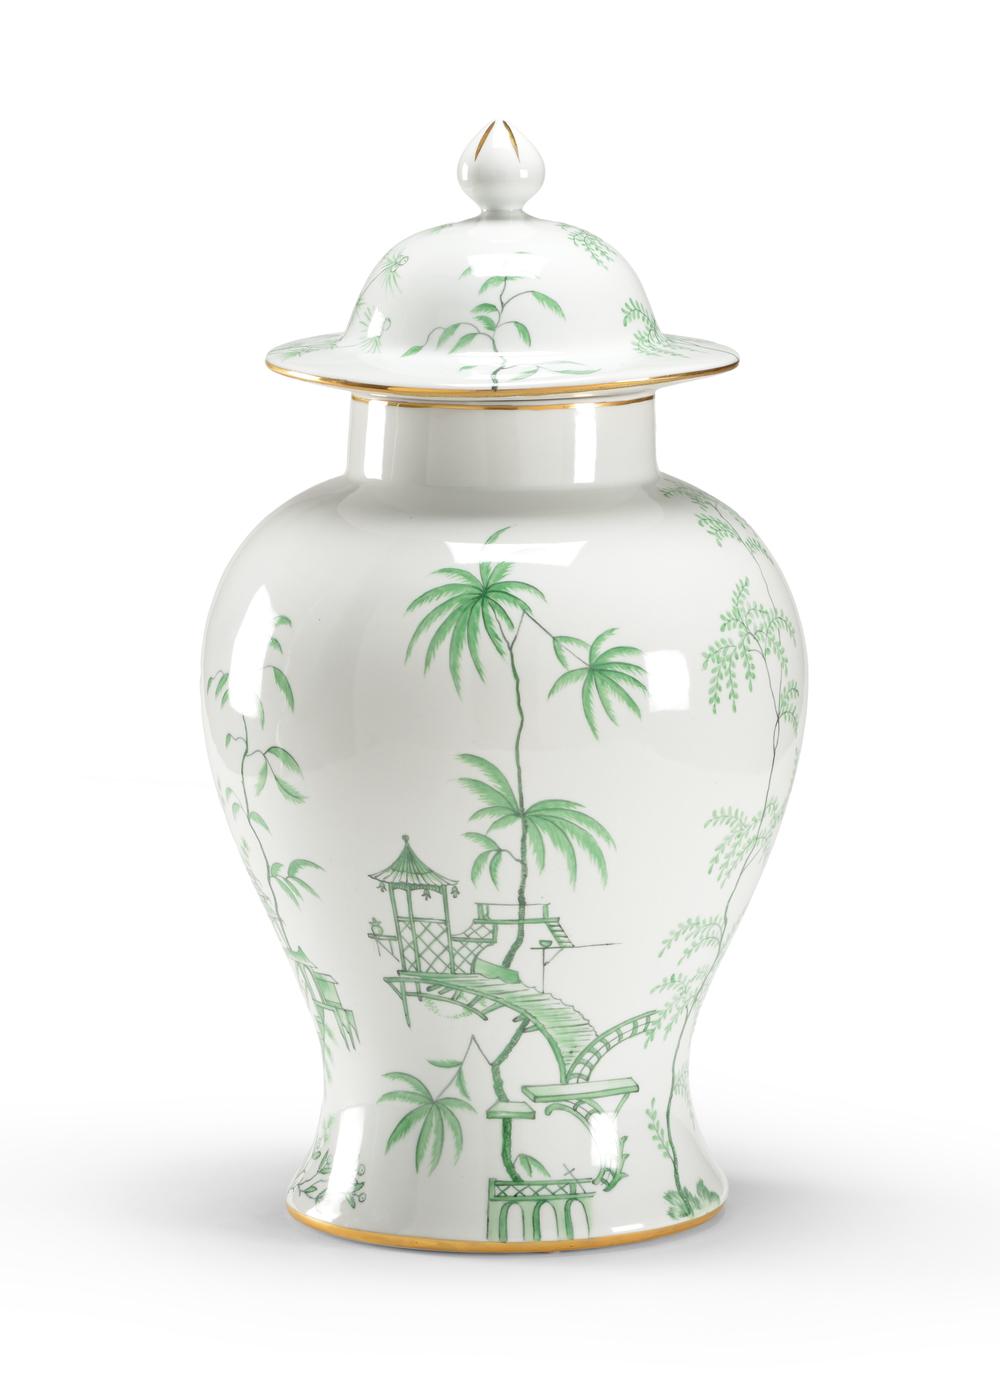 Chelsea House - Green Chinoiserie Jar